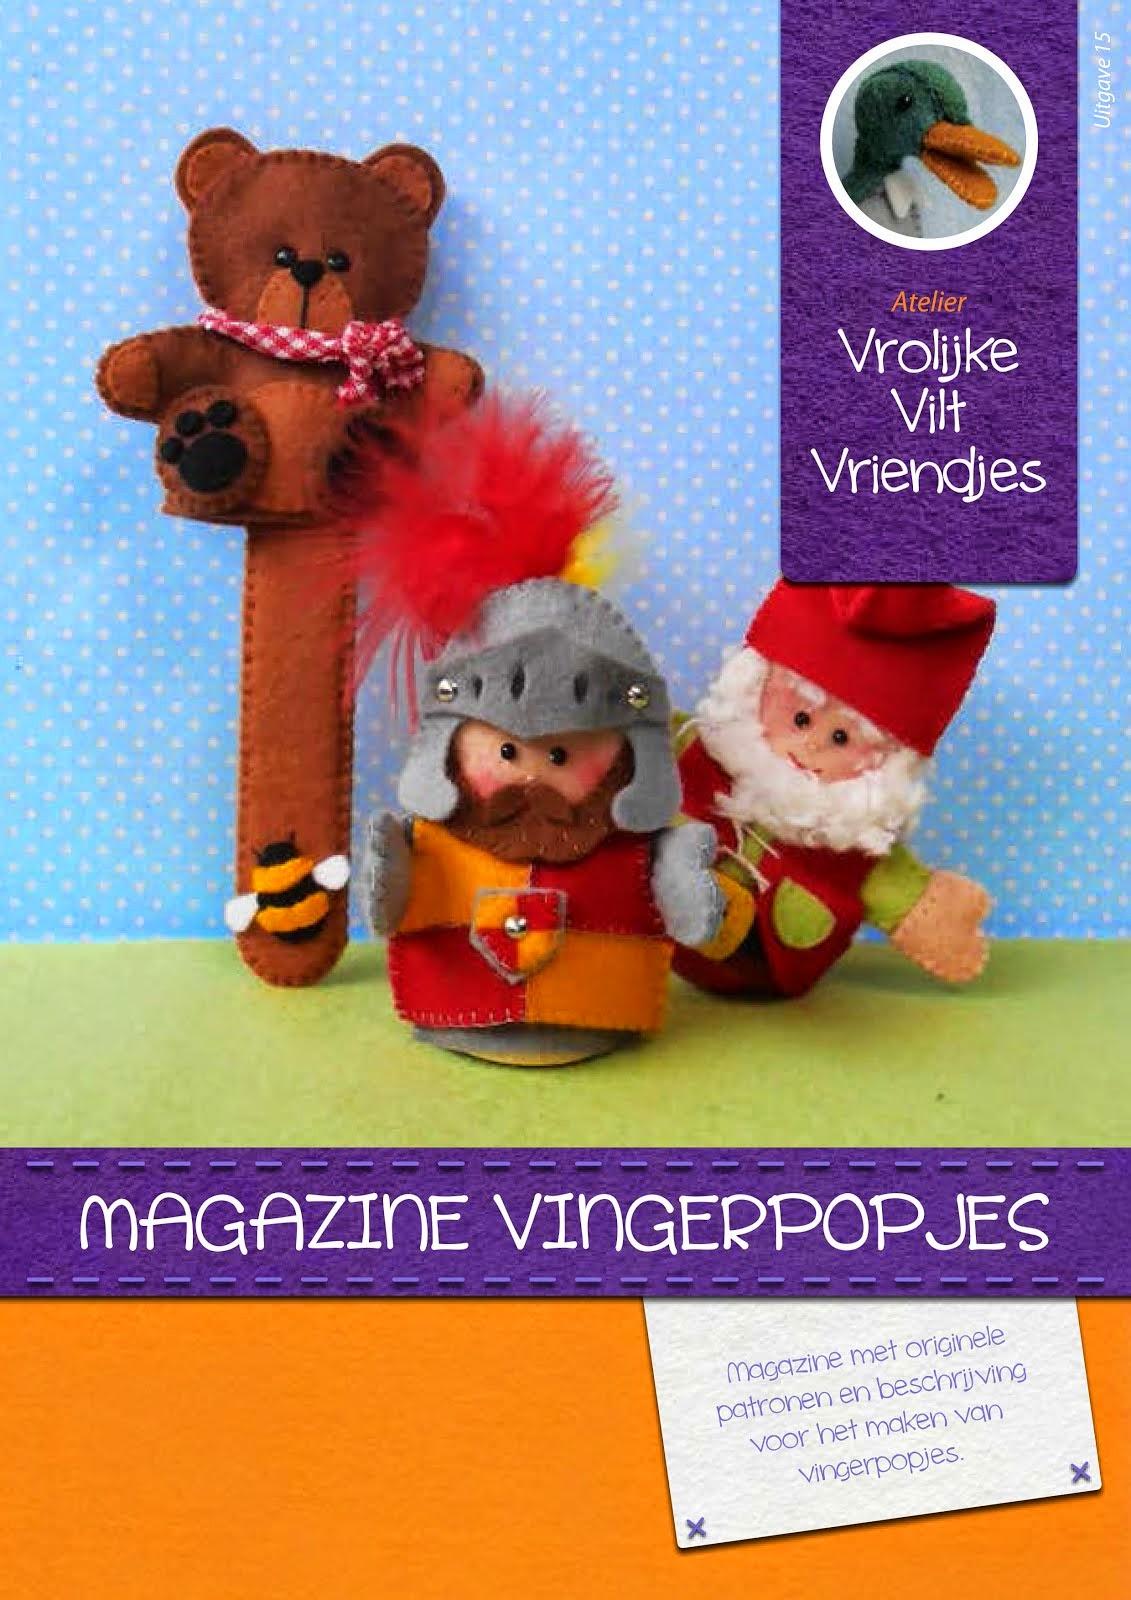 Magazine 15: